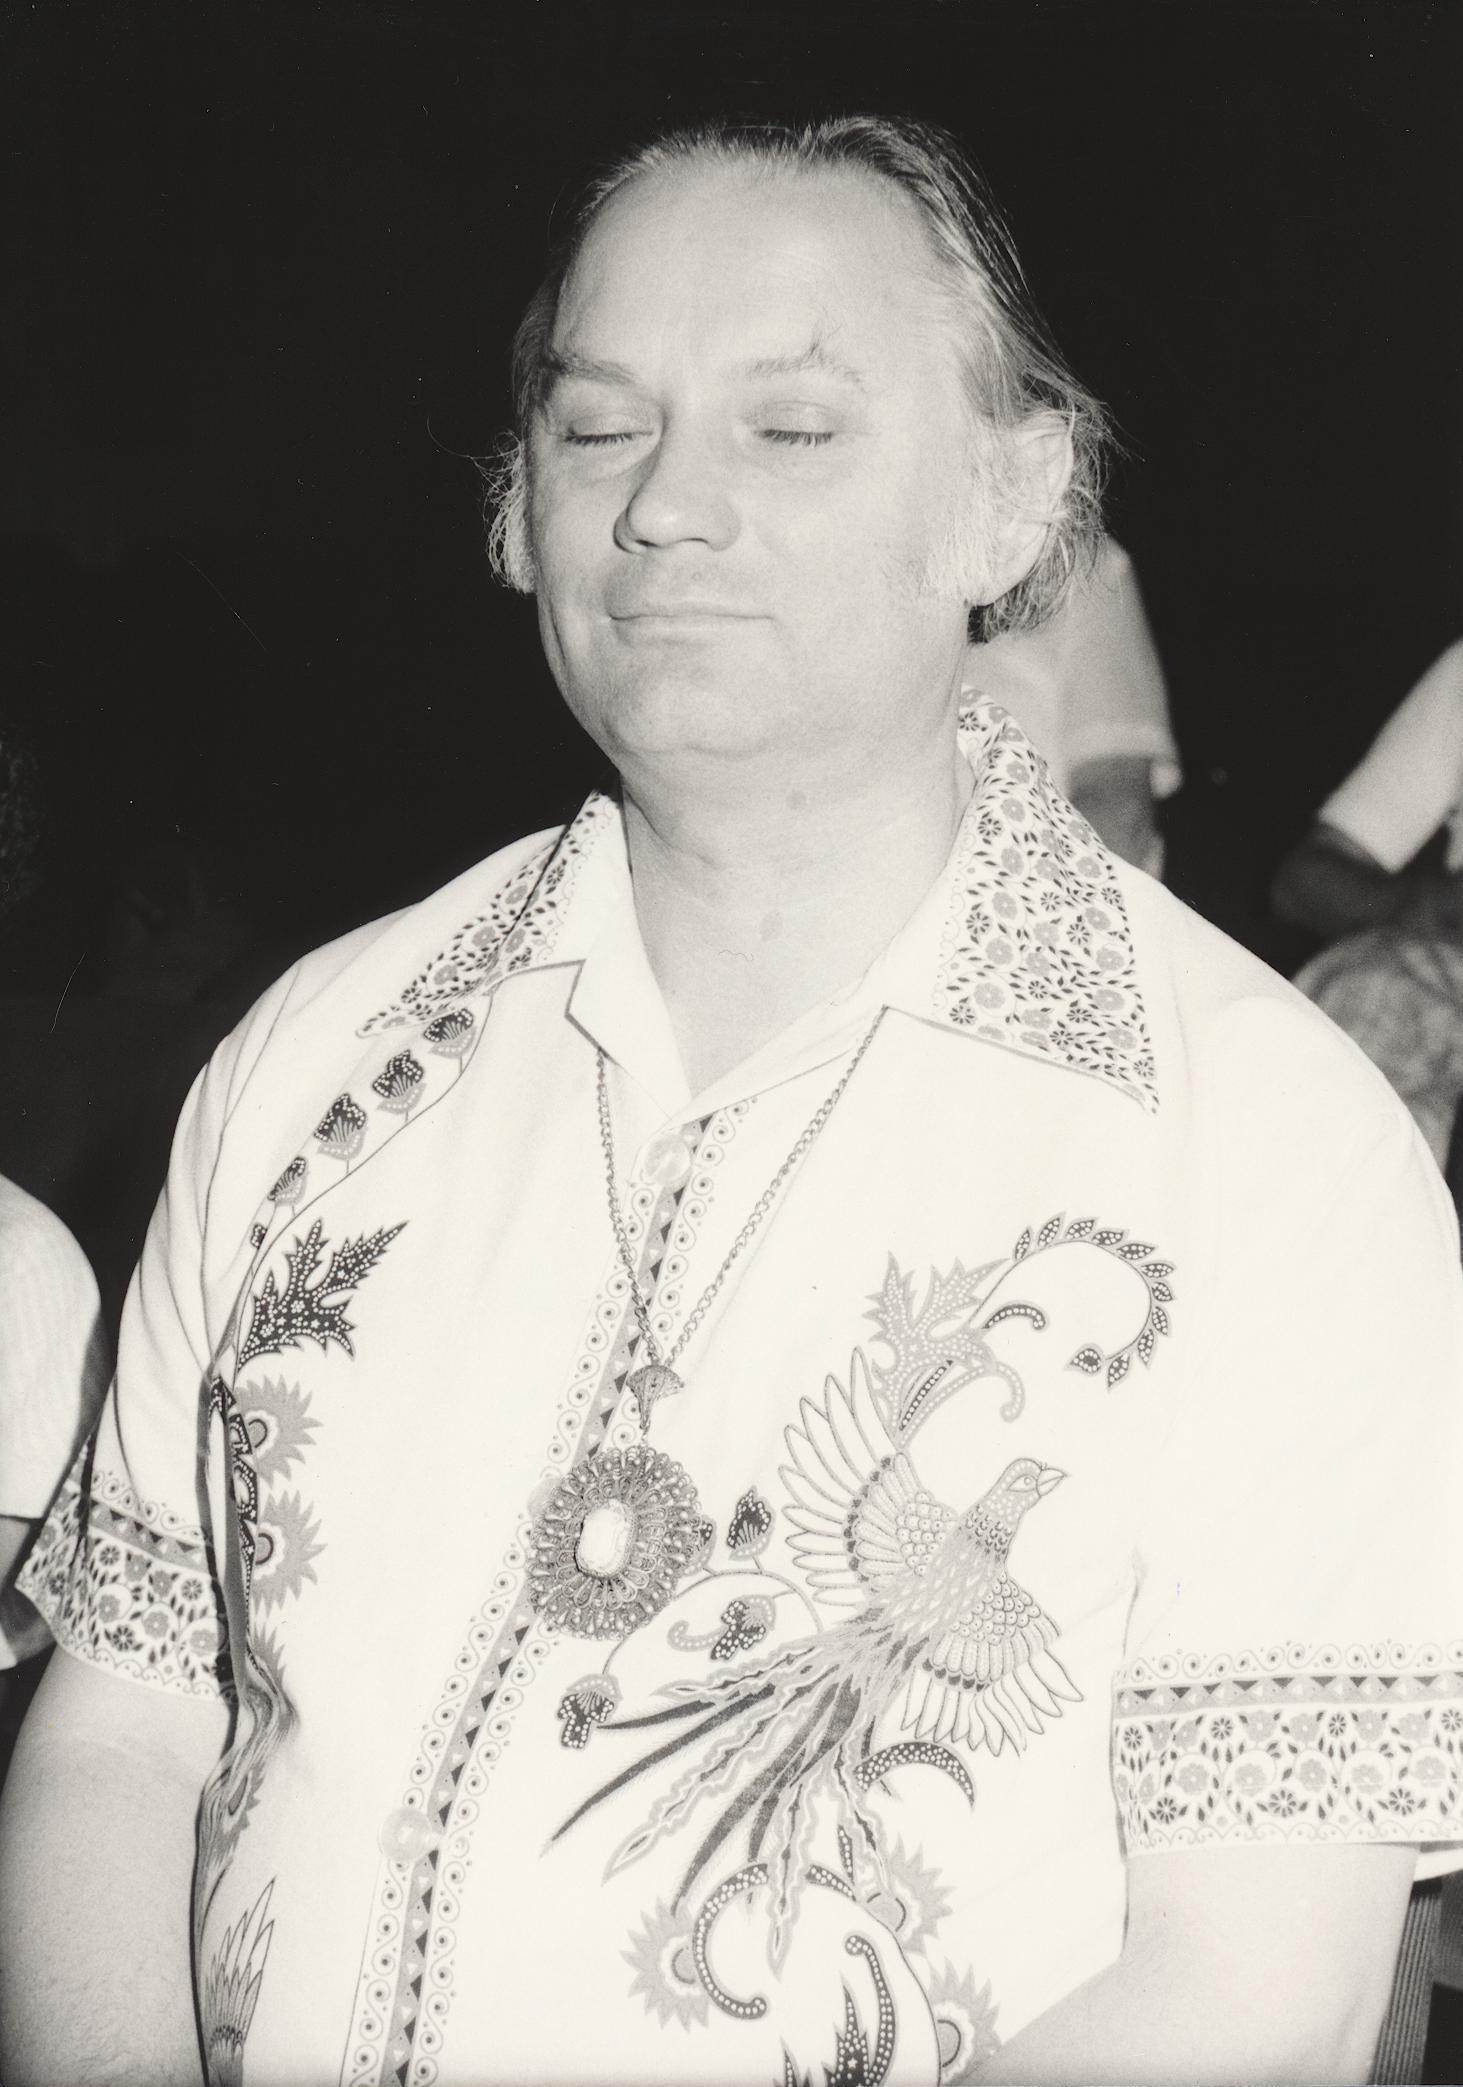 XI. Imago Mundi-Kongress 1987, Innsbruck, Manfred Kage